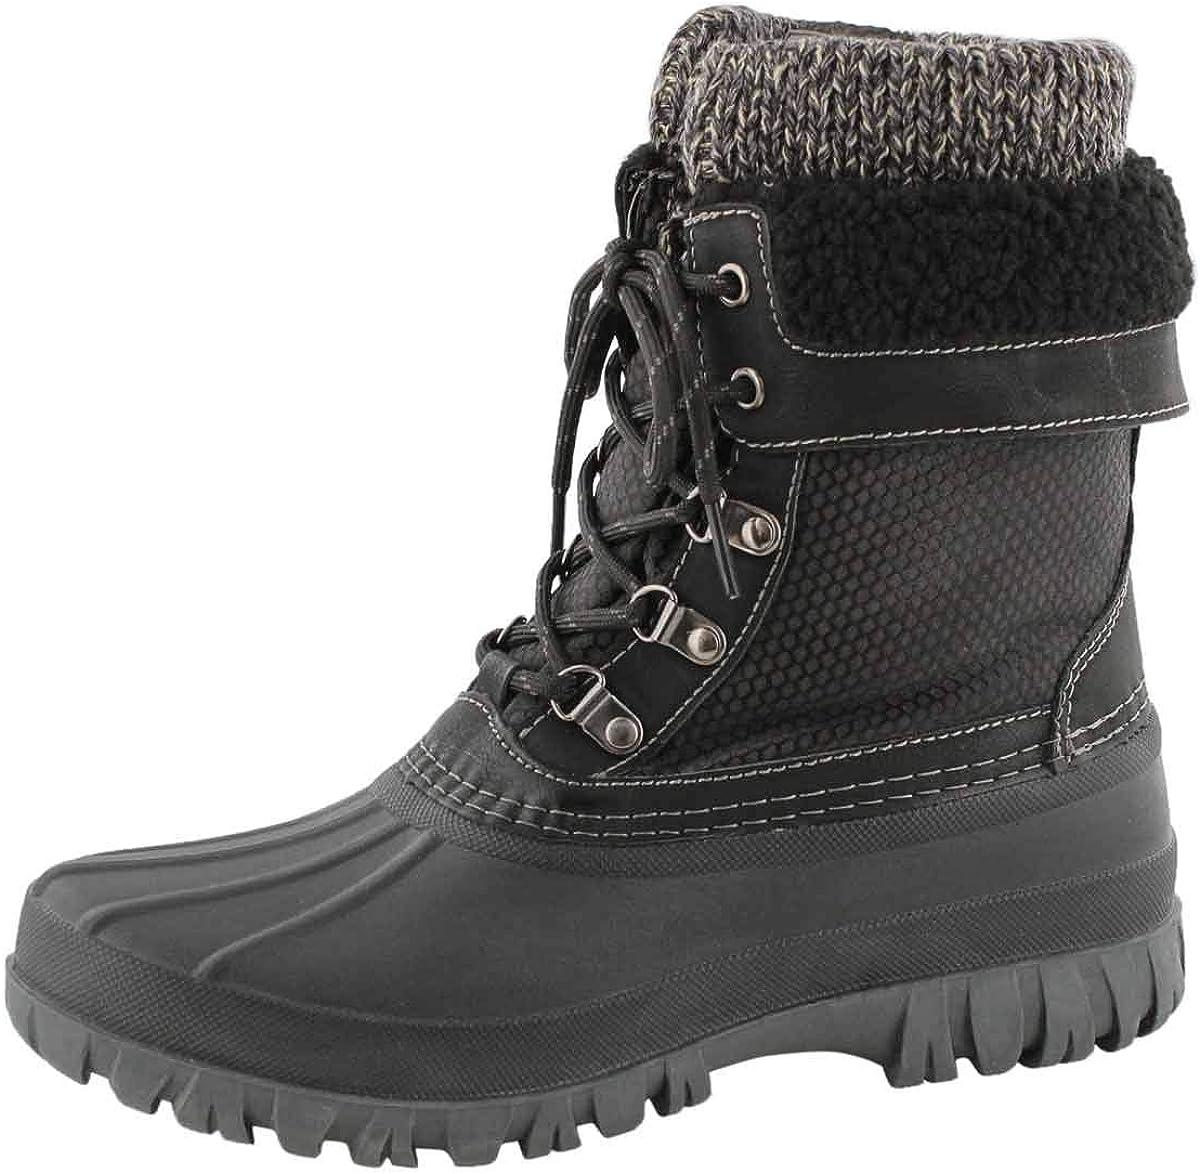 Cougar Women's Creek Lace Up Waterproof Winter Boot Grey 9 Medium US